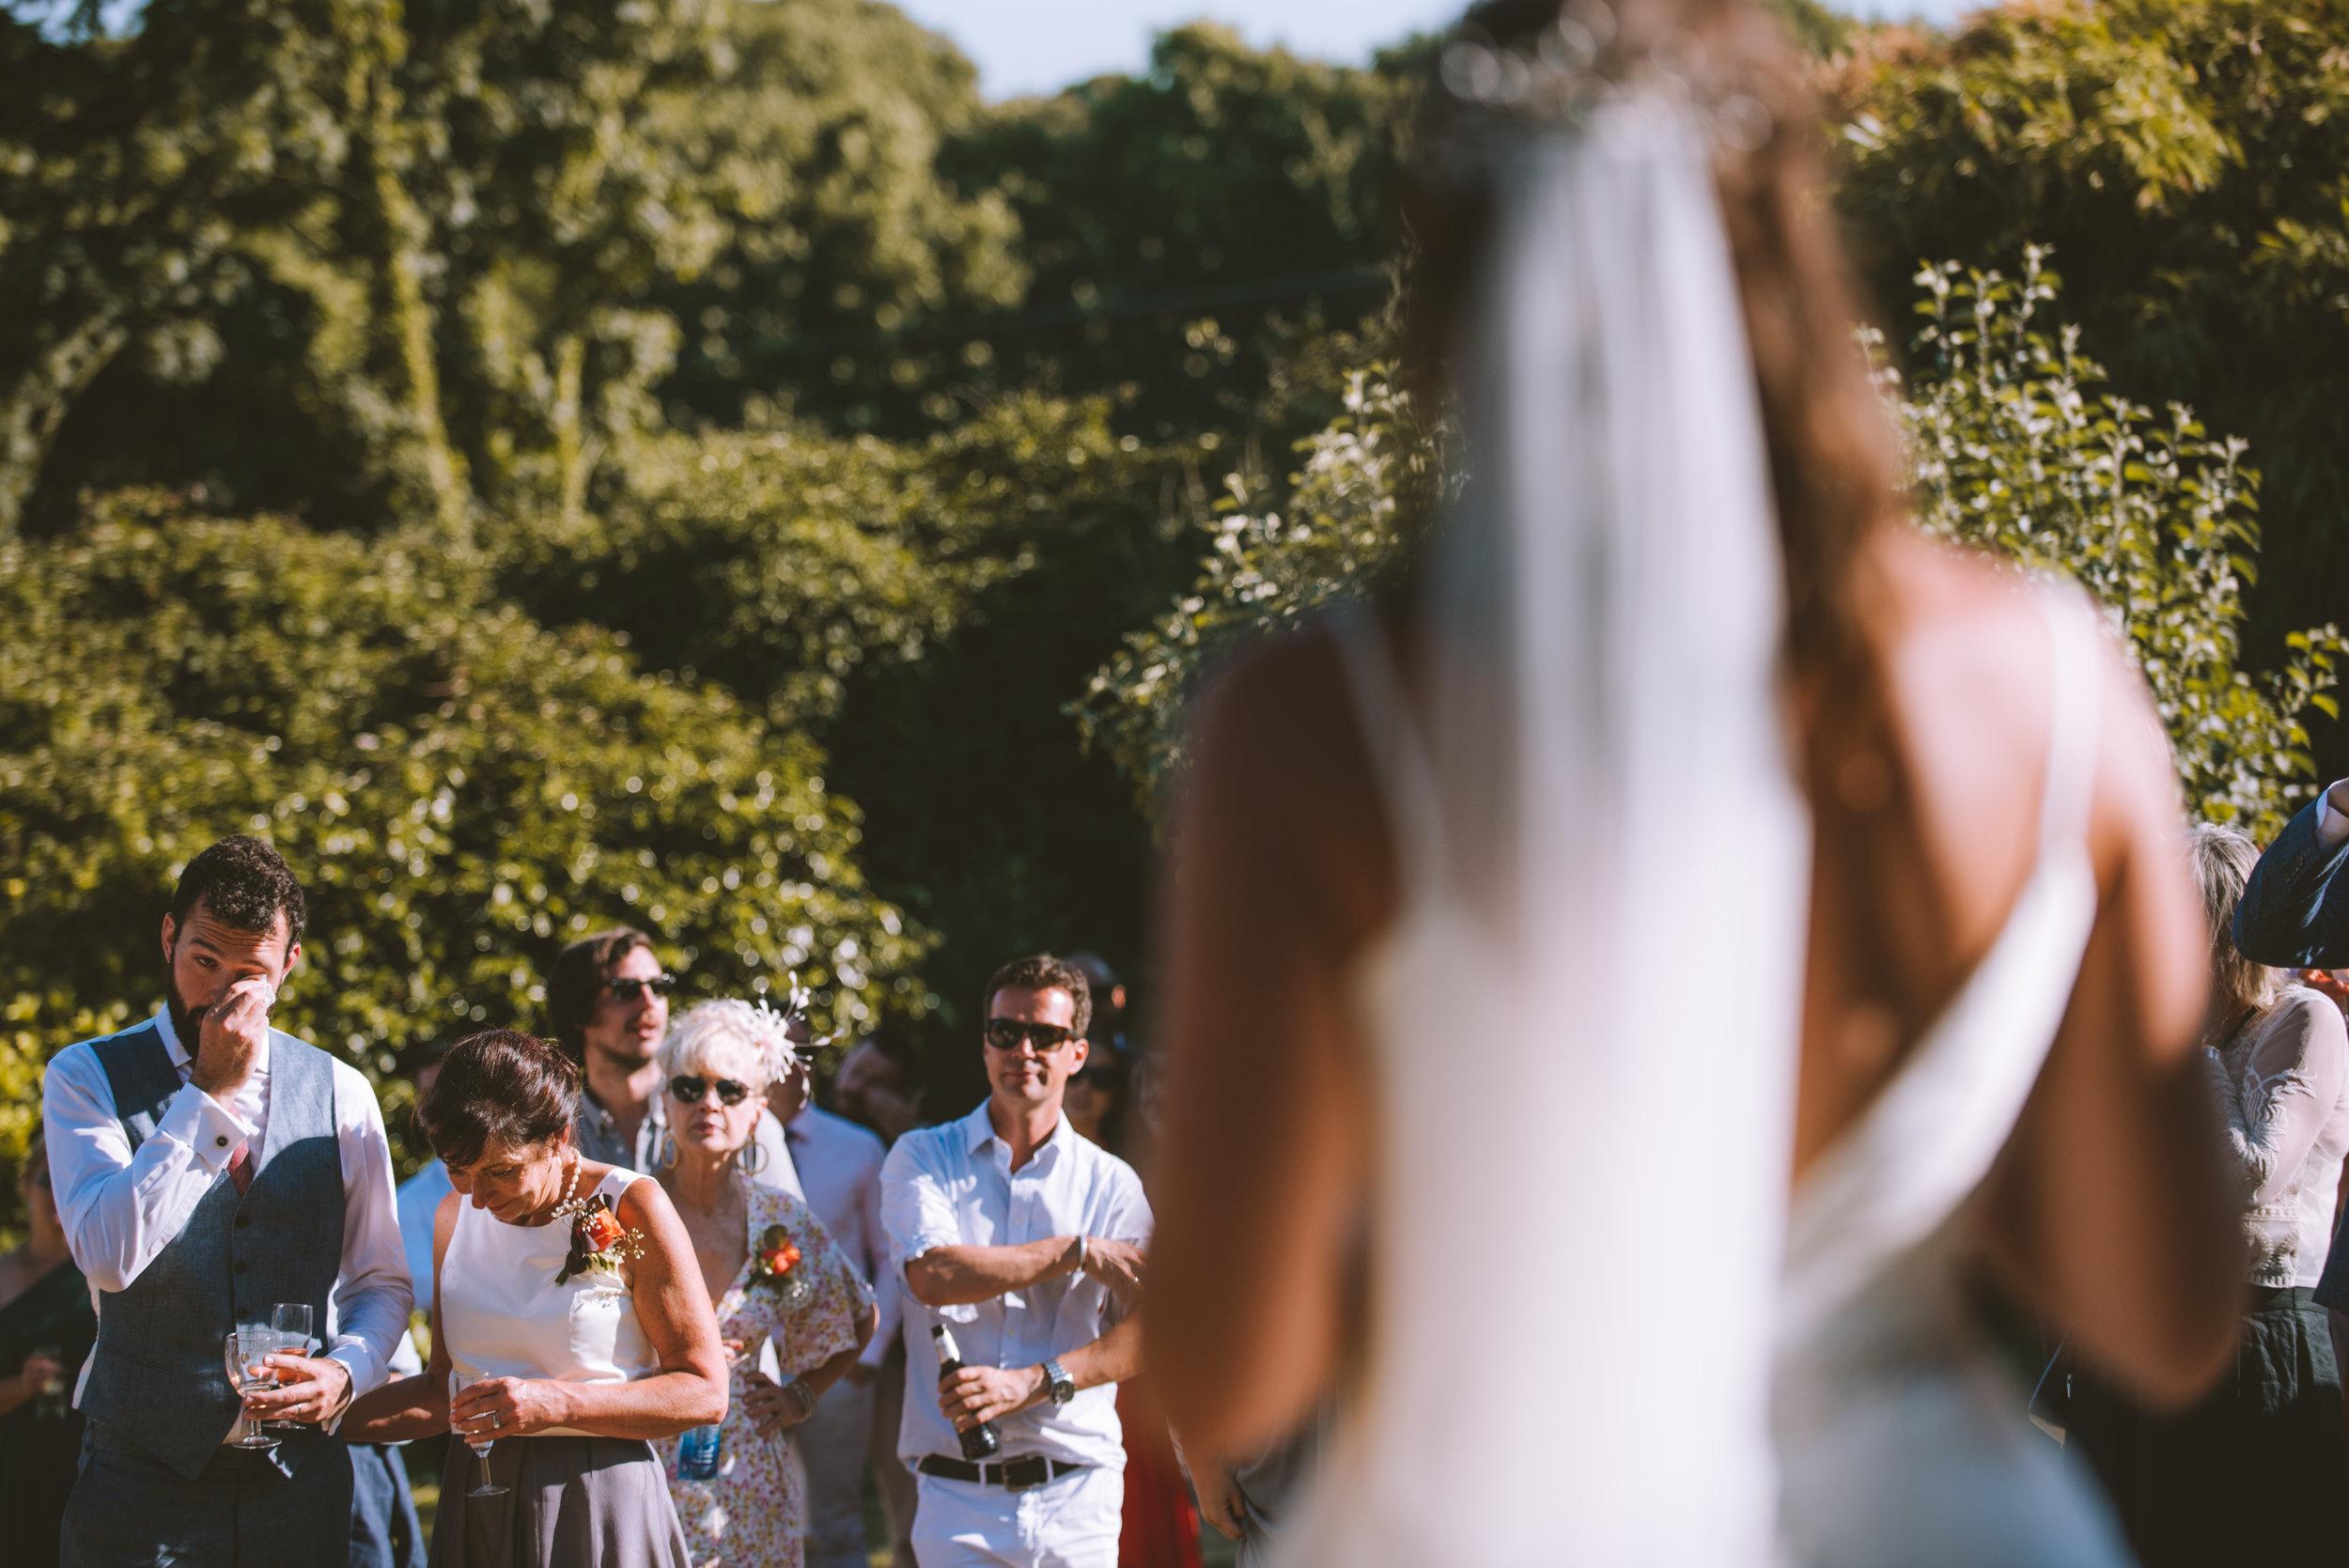 ashbarton-estate-wedding-photographer-mark-shaw-55.jpg